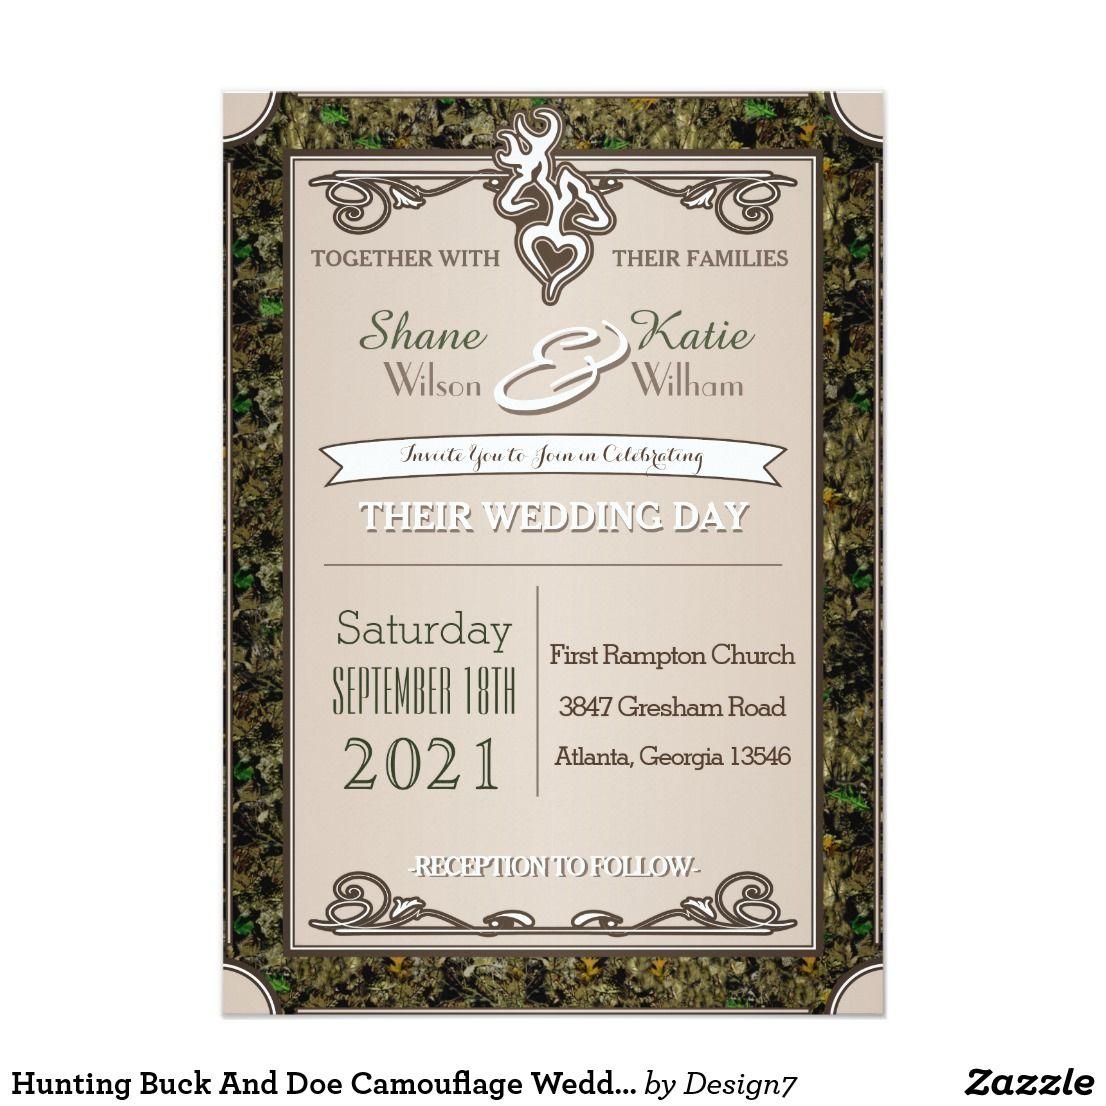 Hunting Buck And Doe Camouflage Wedding Invitation Wedding And Wedding